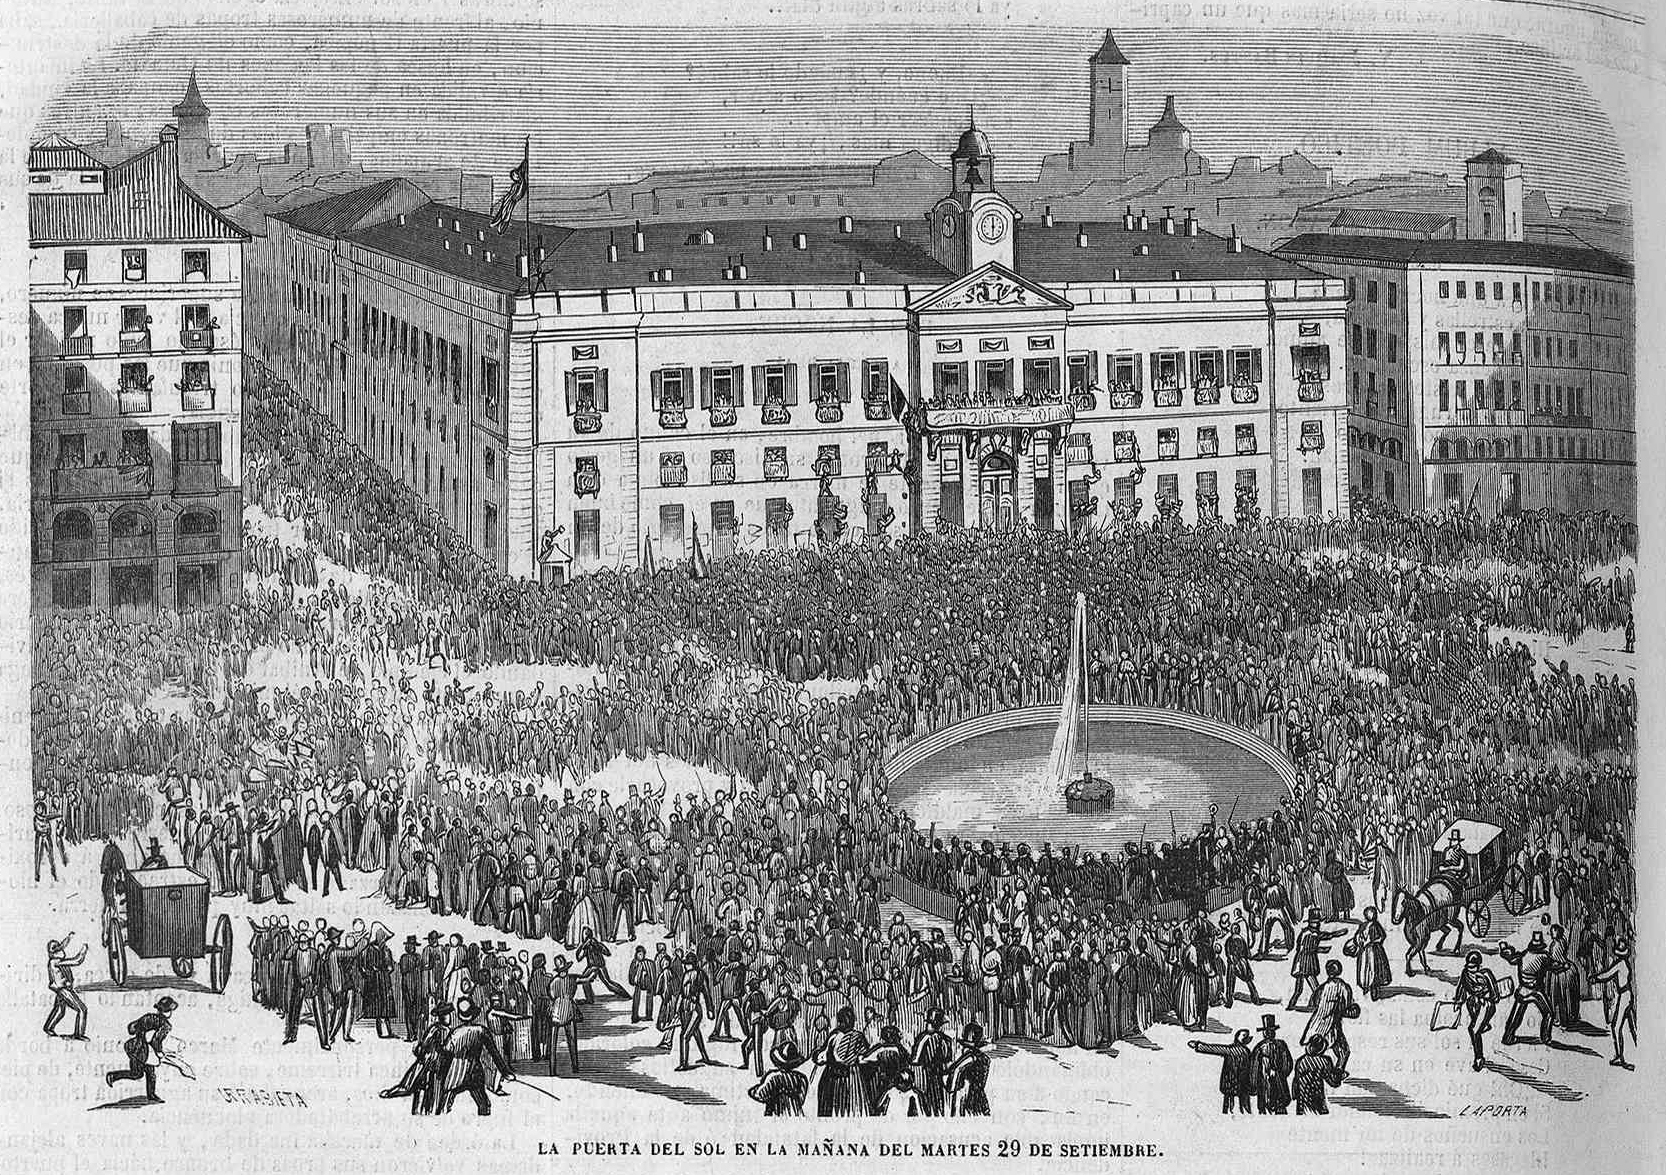 File:La Puerta del Sol en la mañana del 29 de septiembre de 1868,